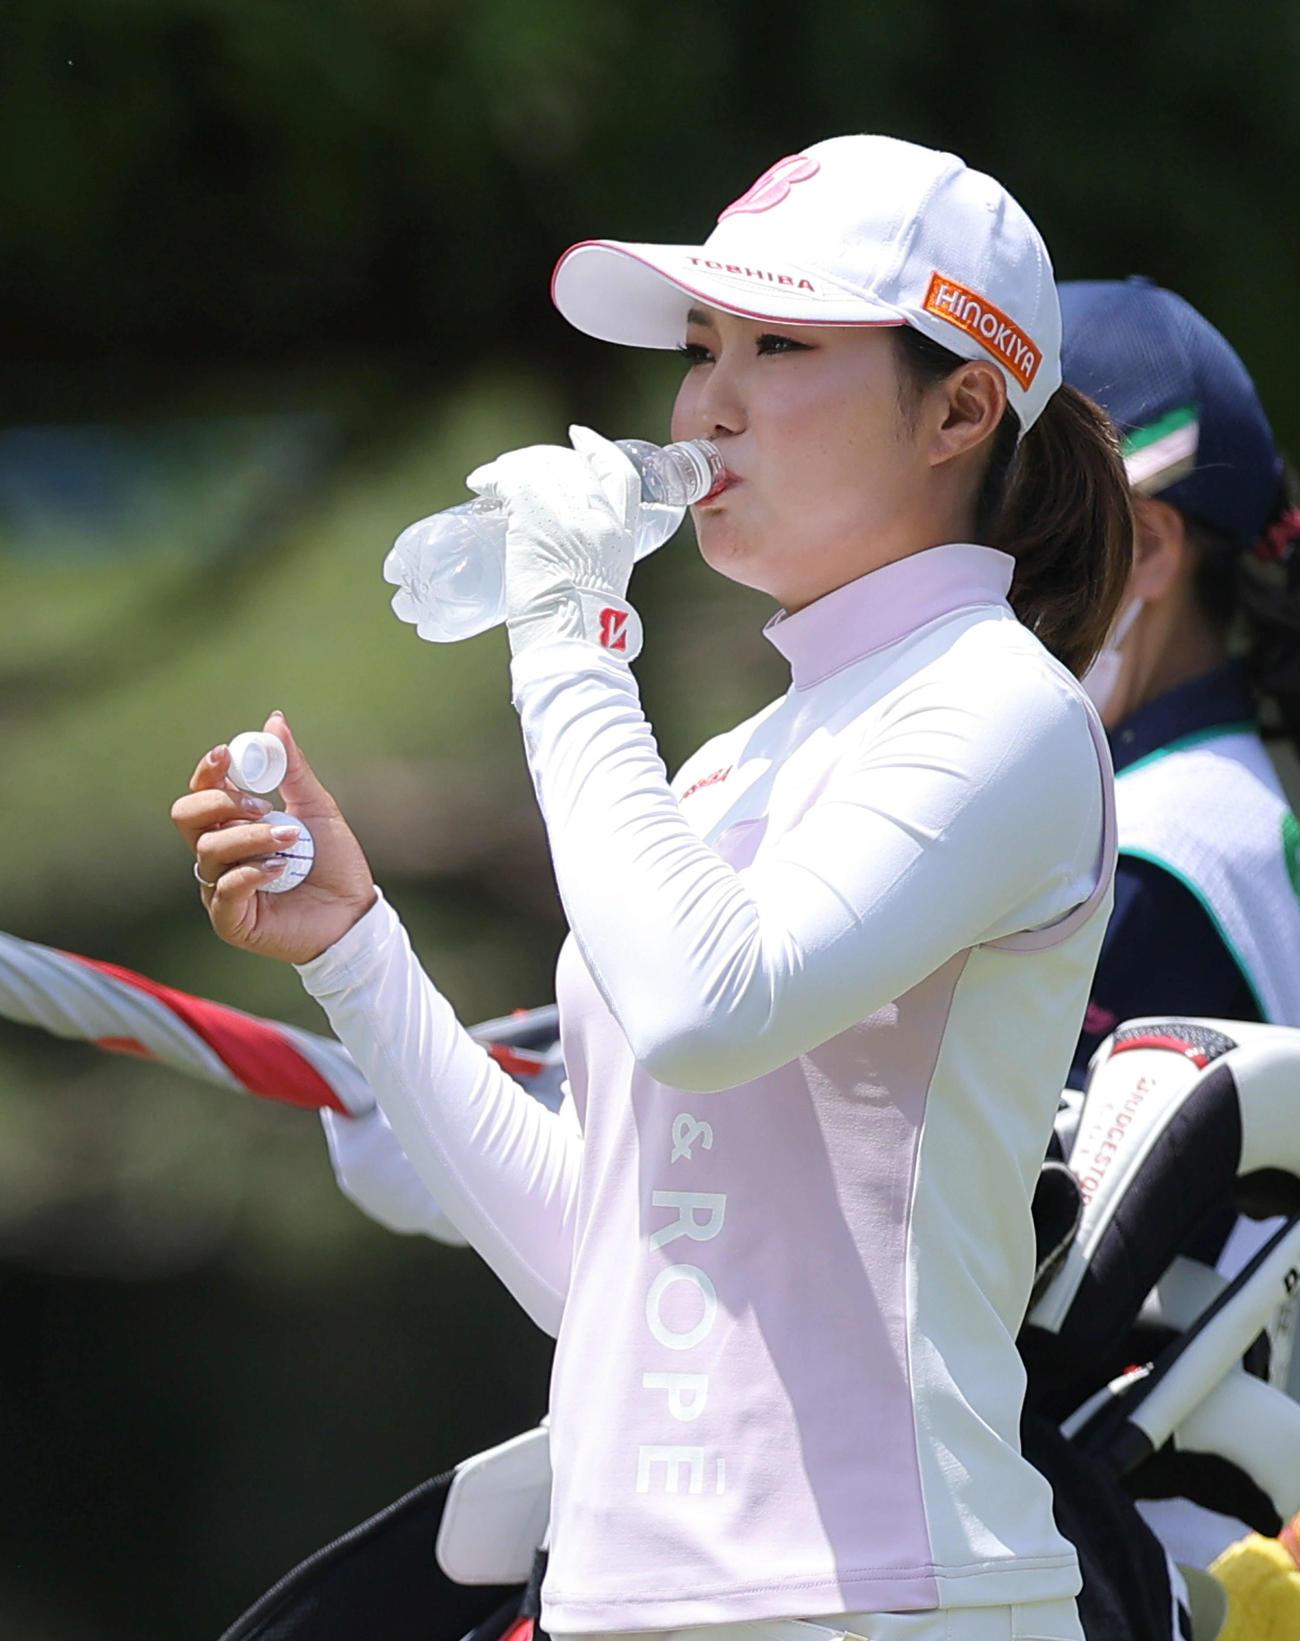 https://www.nikkansports.com/sports/golf/news/img/202105090000429-w1300_1.jpg